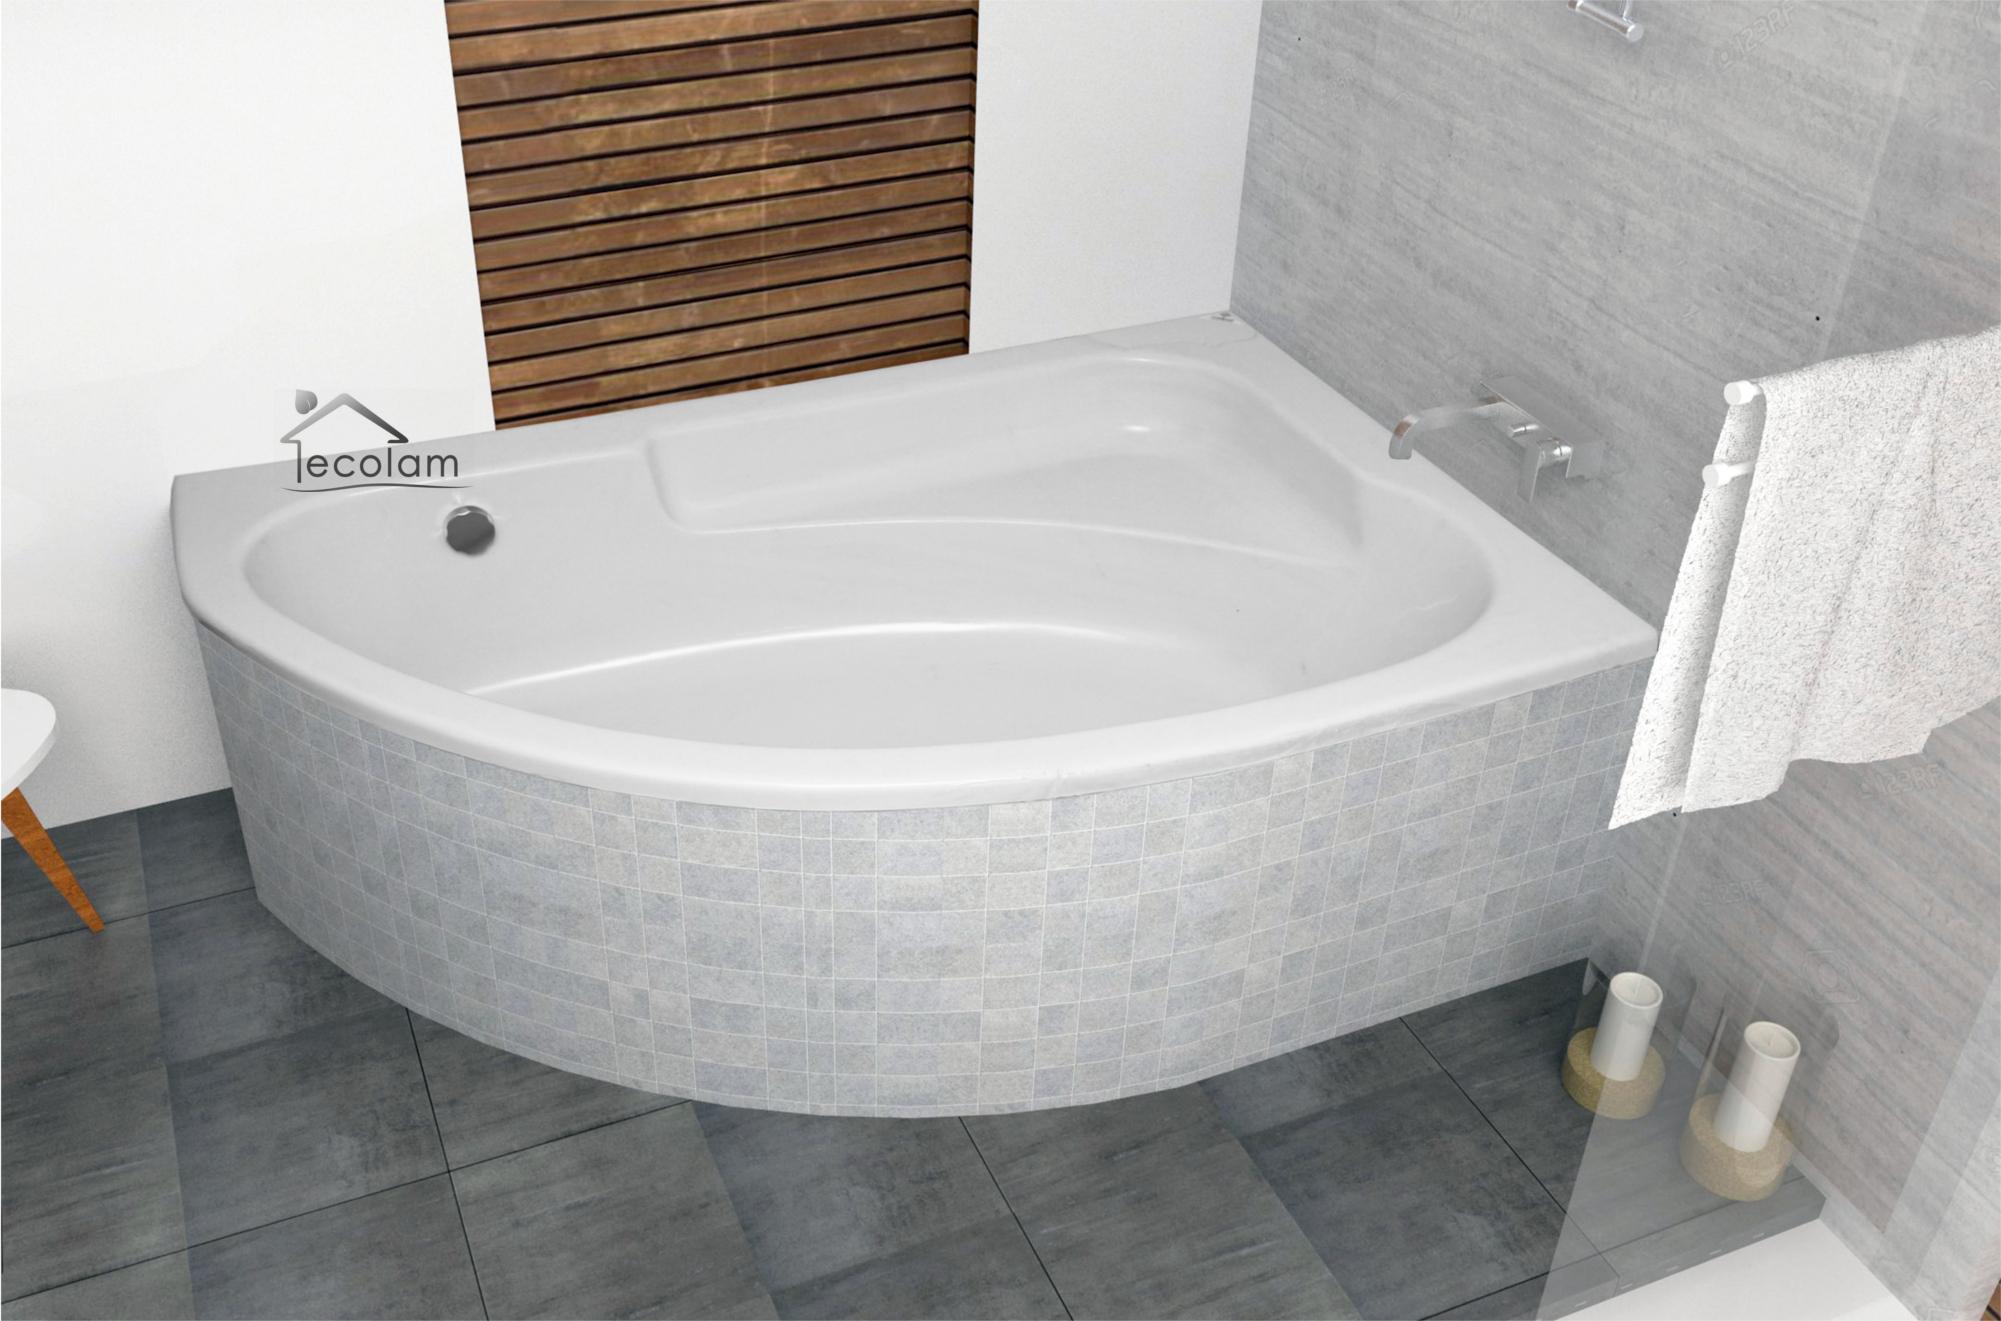 badewanne eckbadewanne 145 x 95 wannentr ger styropor. Black Bedroom Furniture Sets. Home Design Ideas